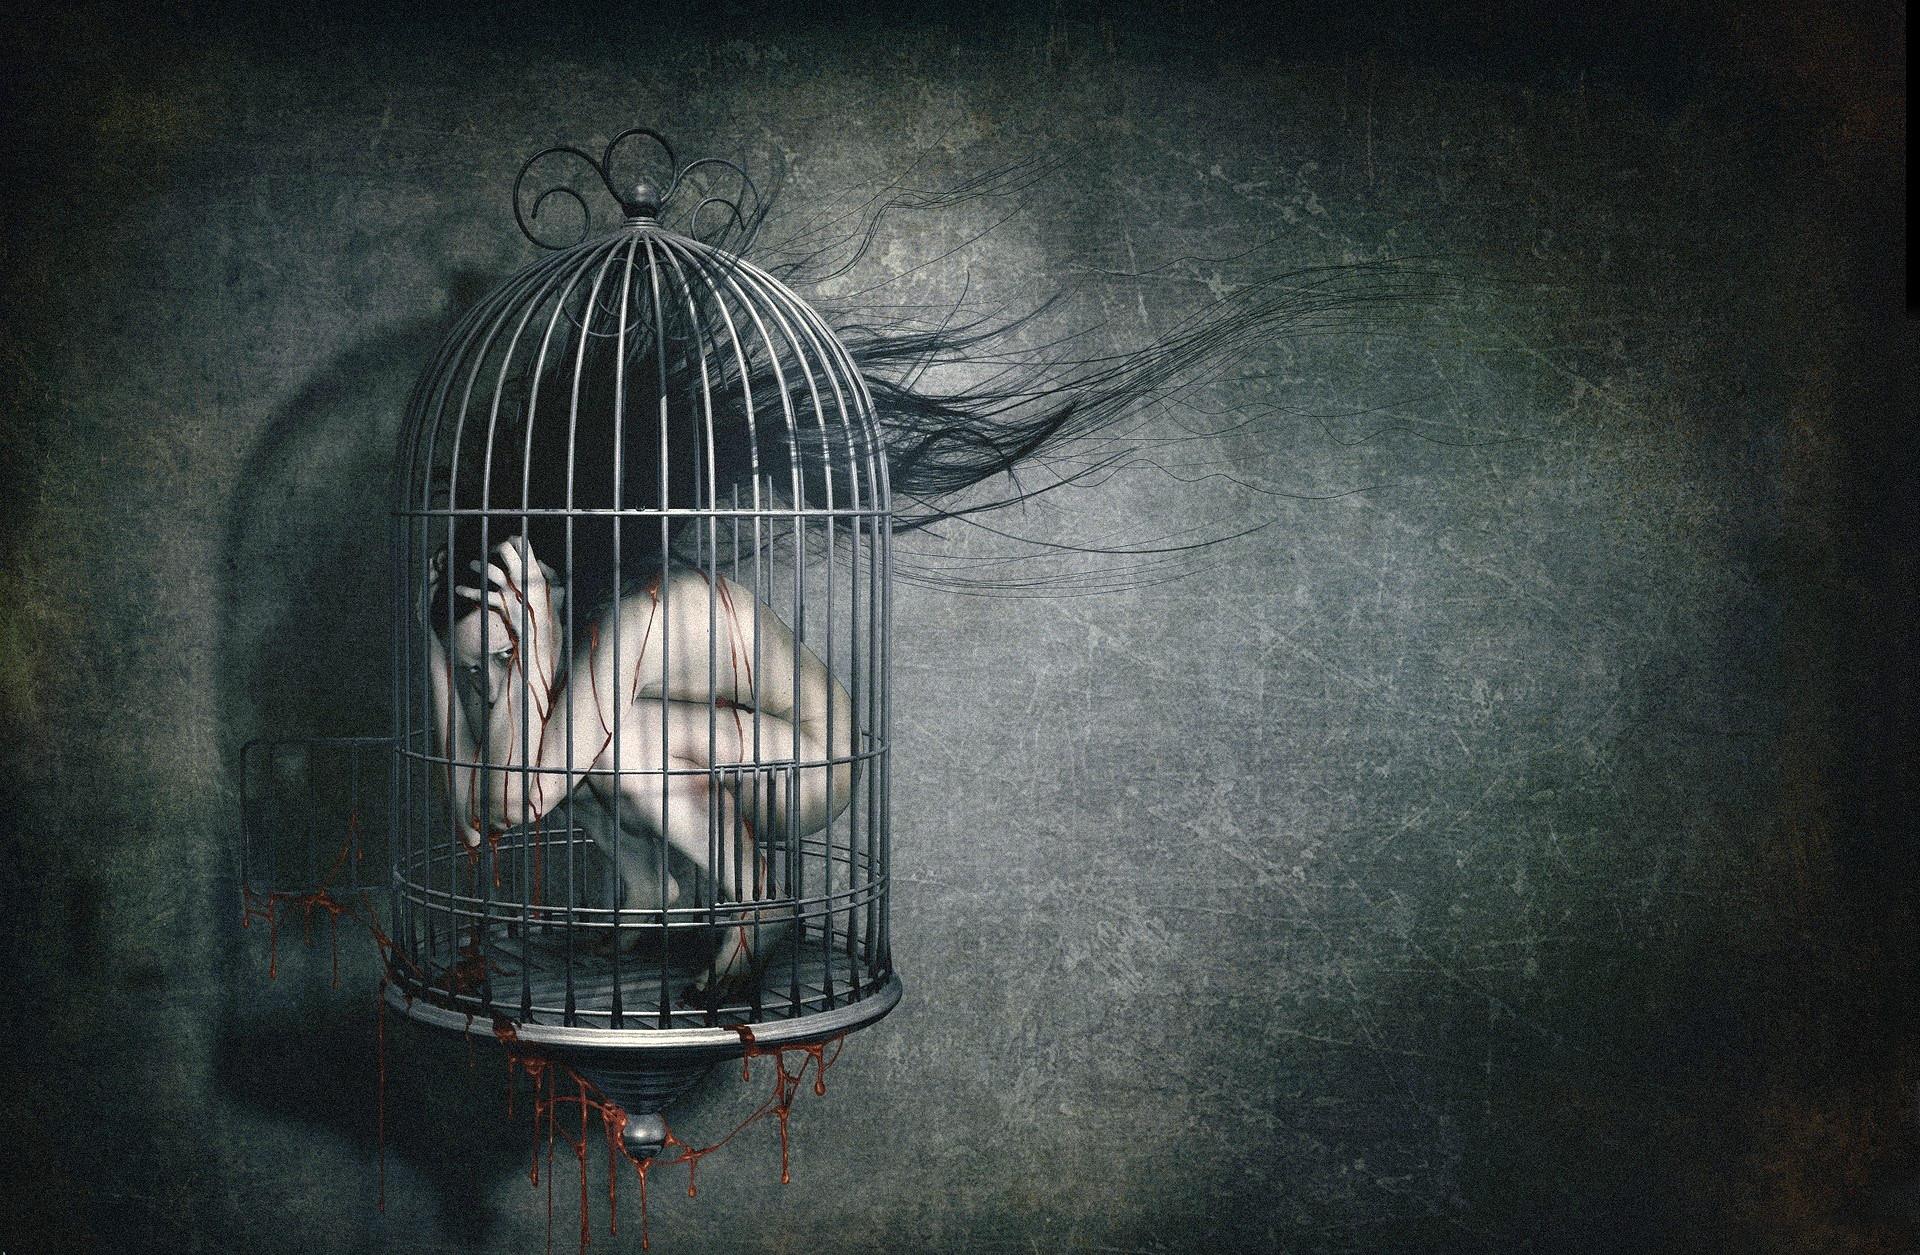 view image. Found on: dark-depressing-wallpaper/